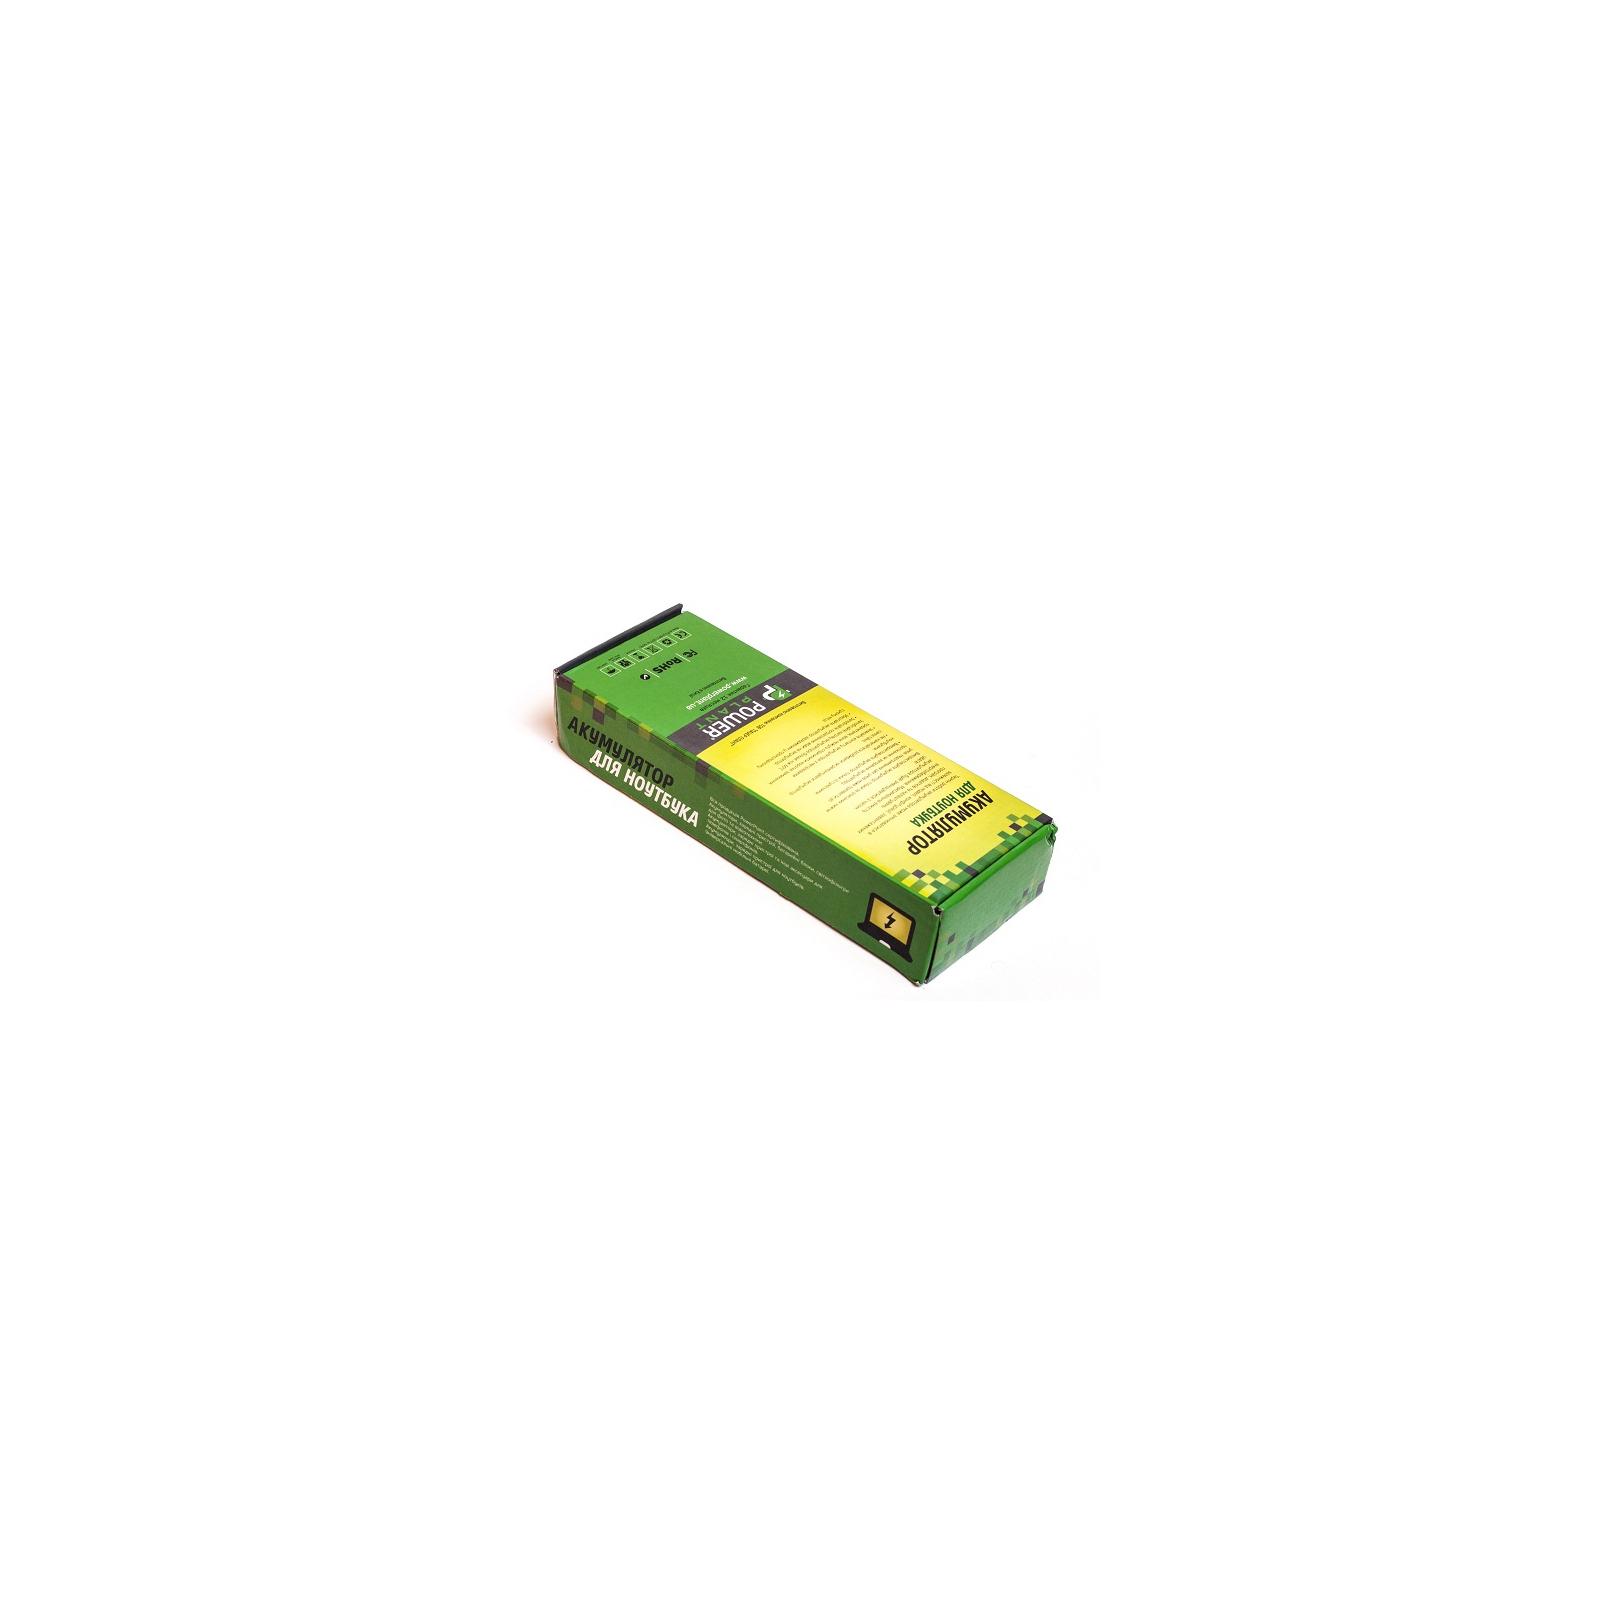 Аккумулятор для ноутбука ASUS A32-K52 (A32-K52, ASA420LH) 10.8V 4400mAh PowerPlant (NB00000284) изображение 2